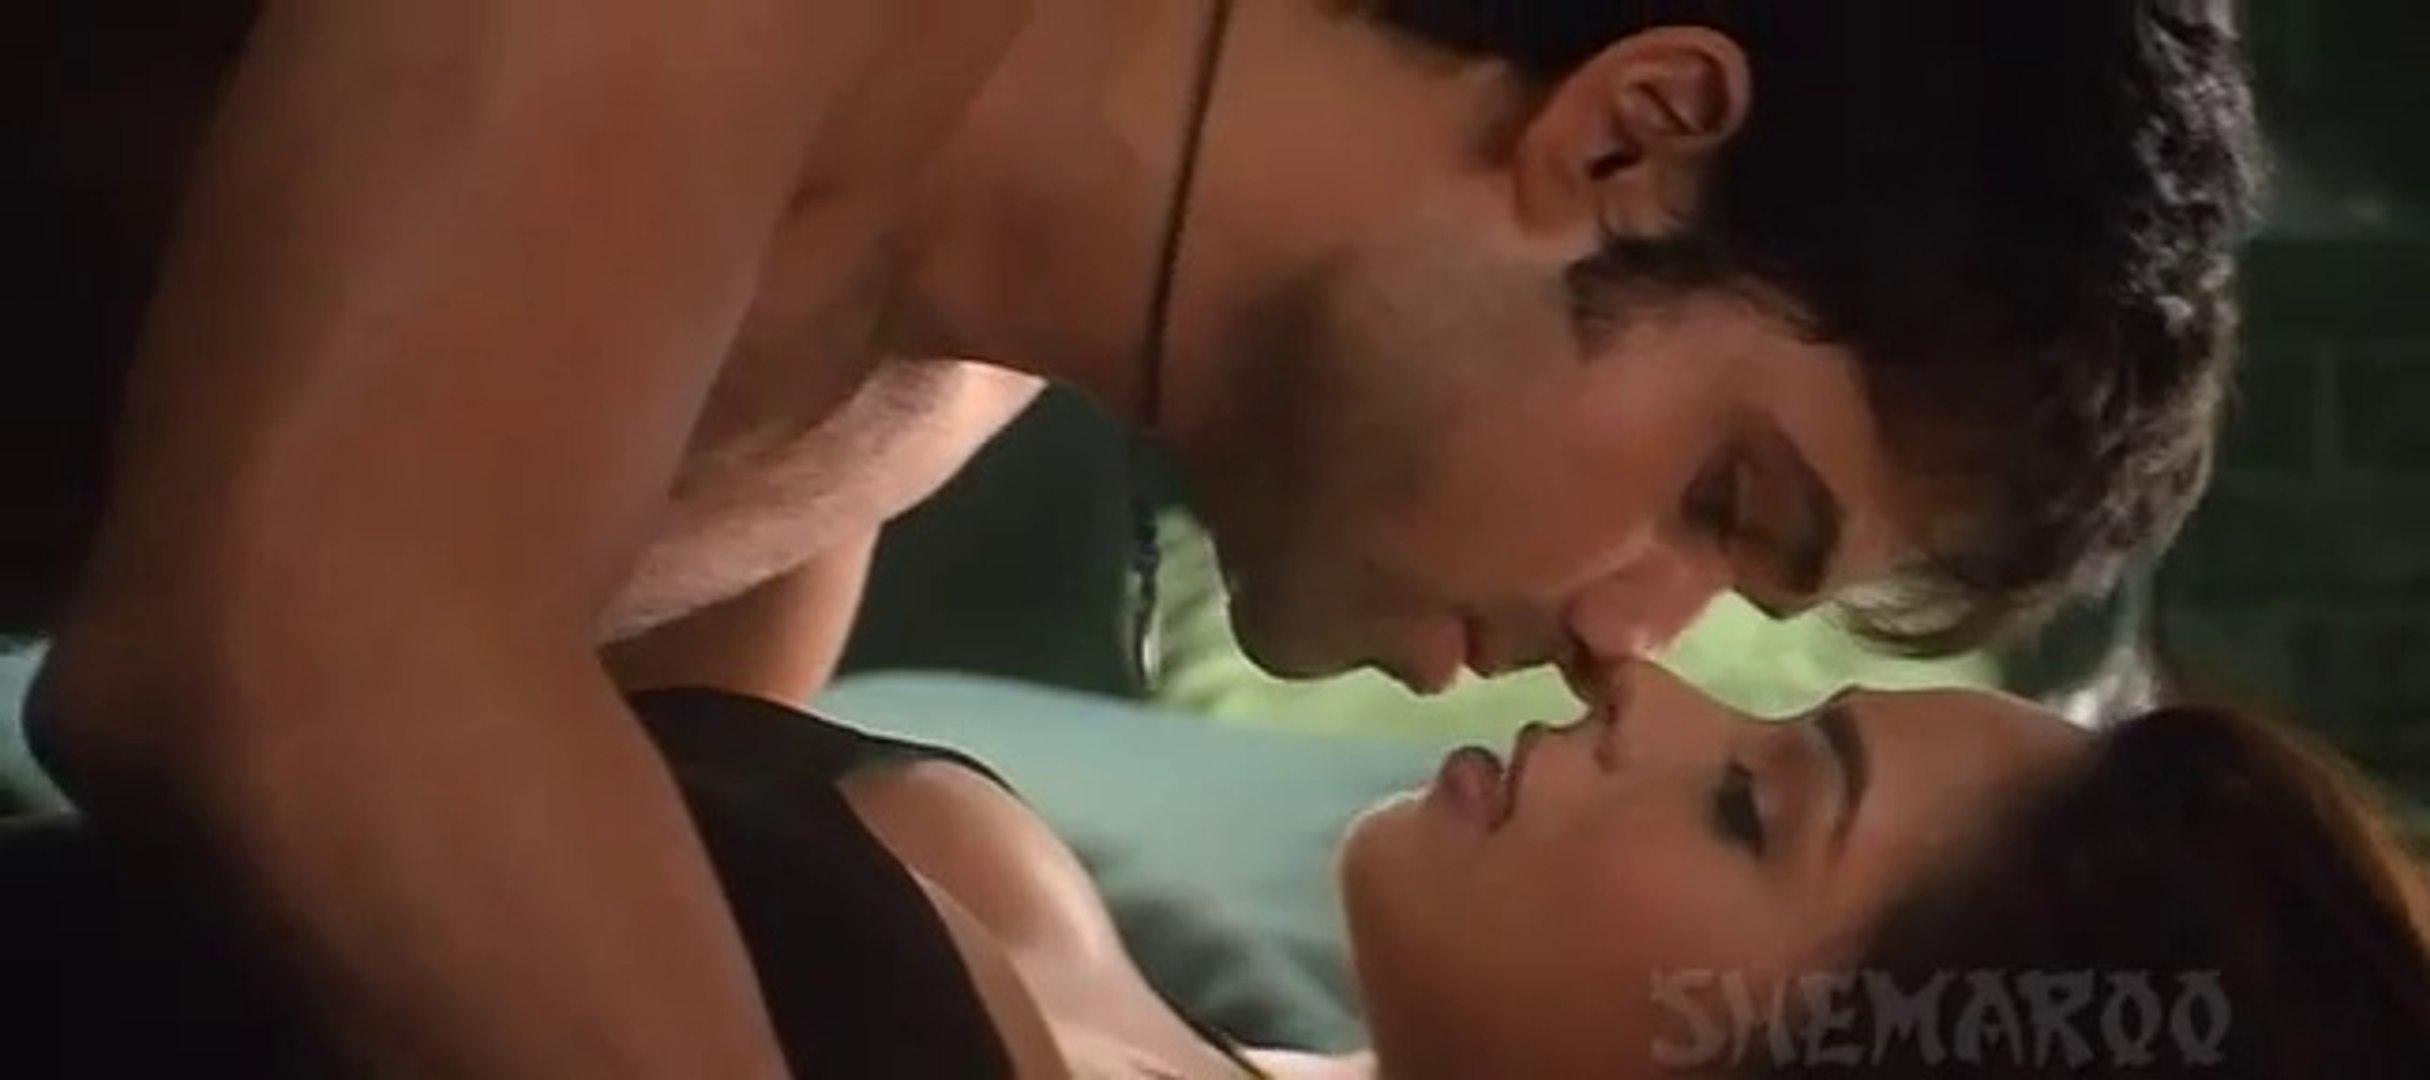 Murder (2004) Full HD Movie Part 1 - video dailymotion